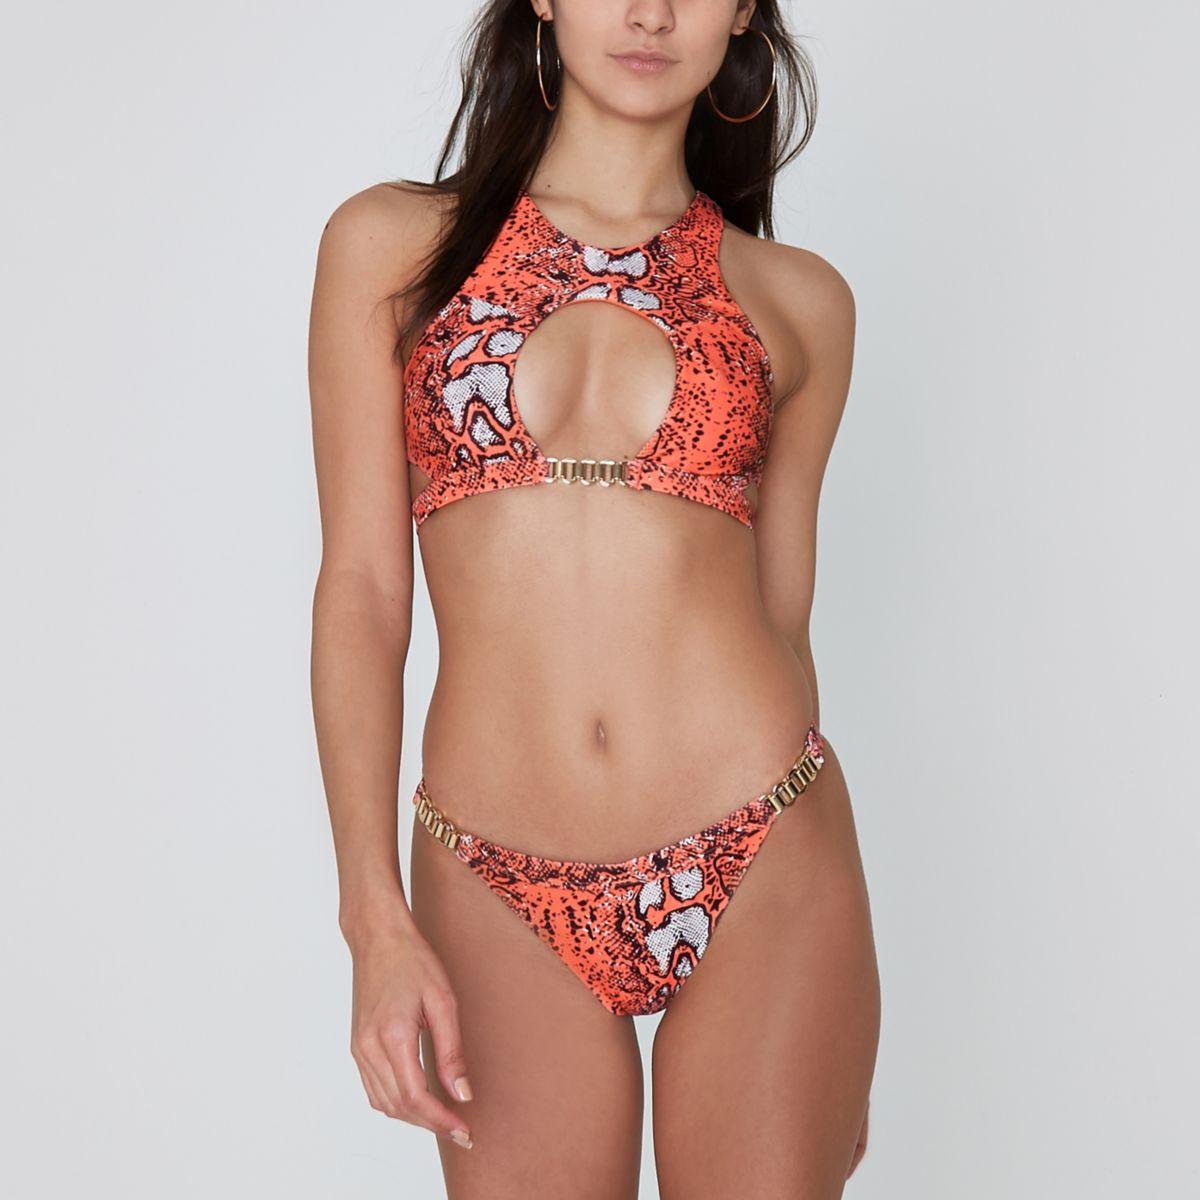 Coral snakeskin cut out longline bikini top